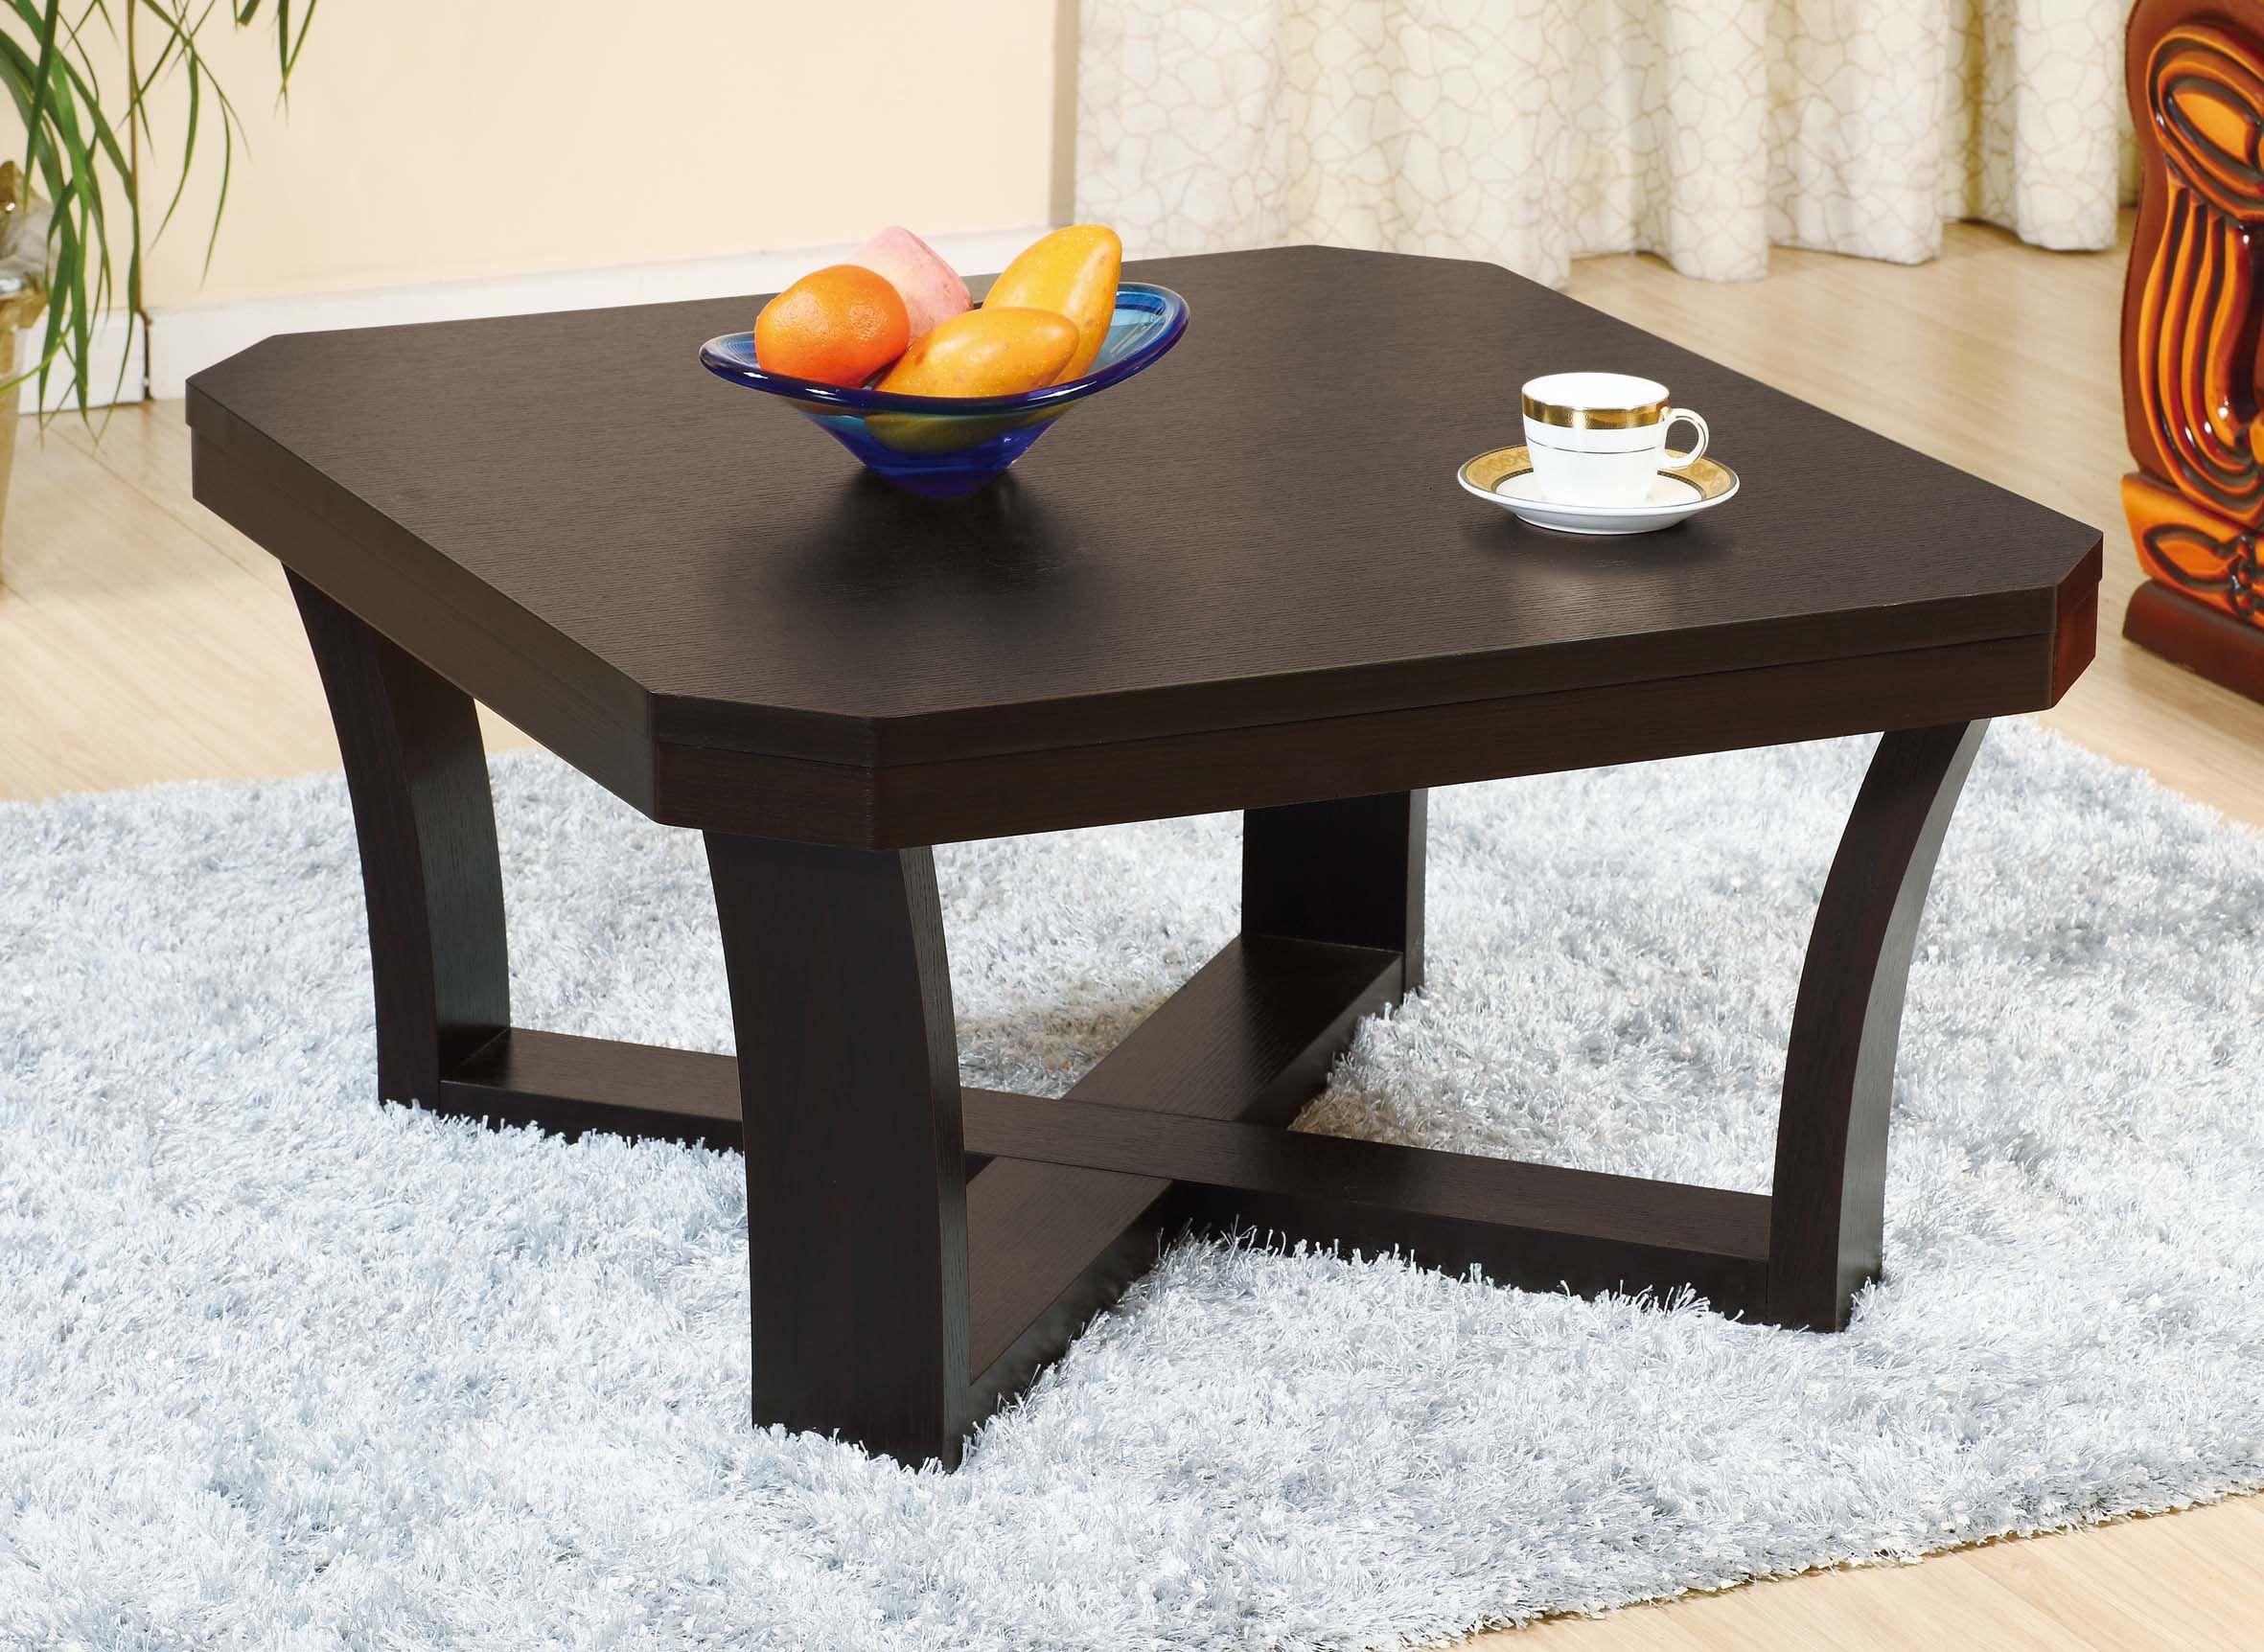 Id usa furniture distributor no 13774ct coffee table features a id usa furniture distributor no 13774ct coffee table features a square table top with flattened geotapseo Images